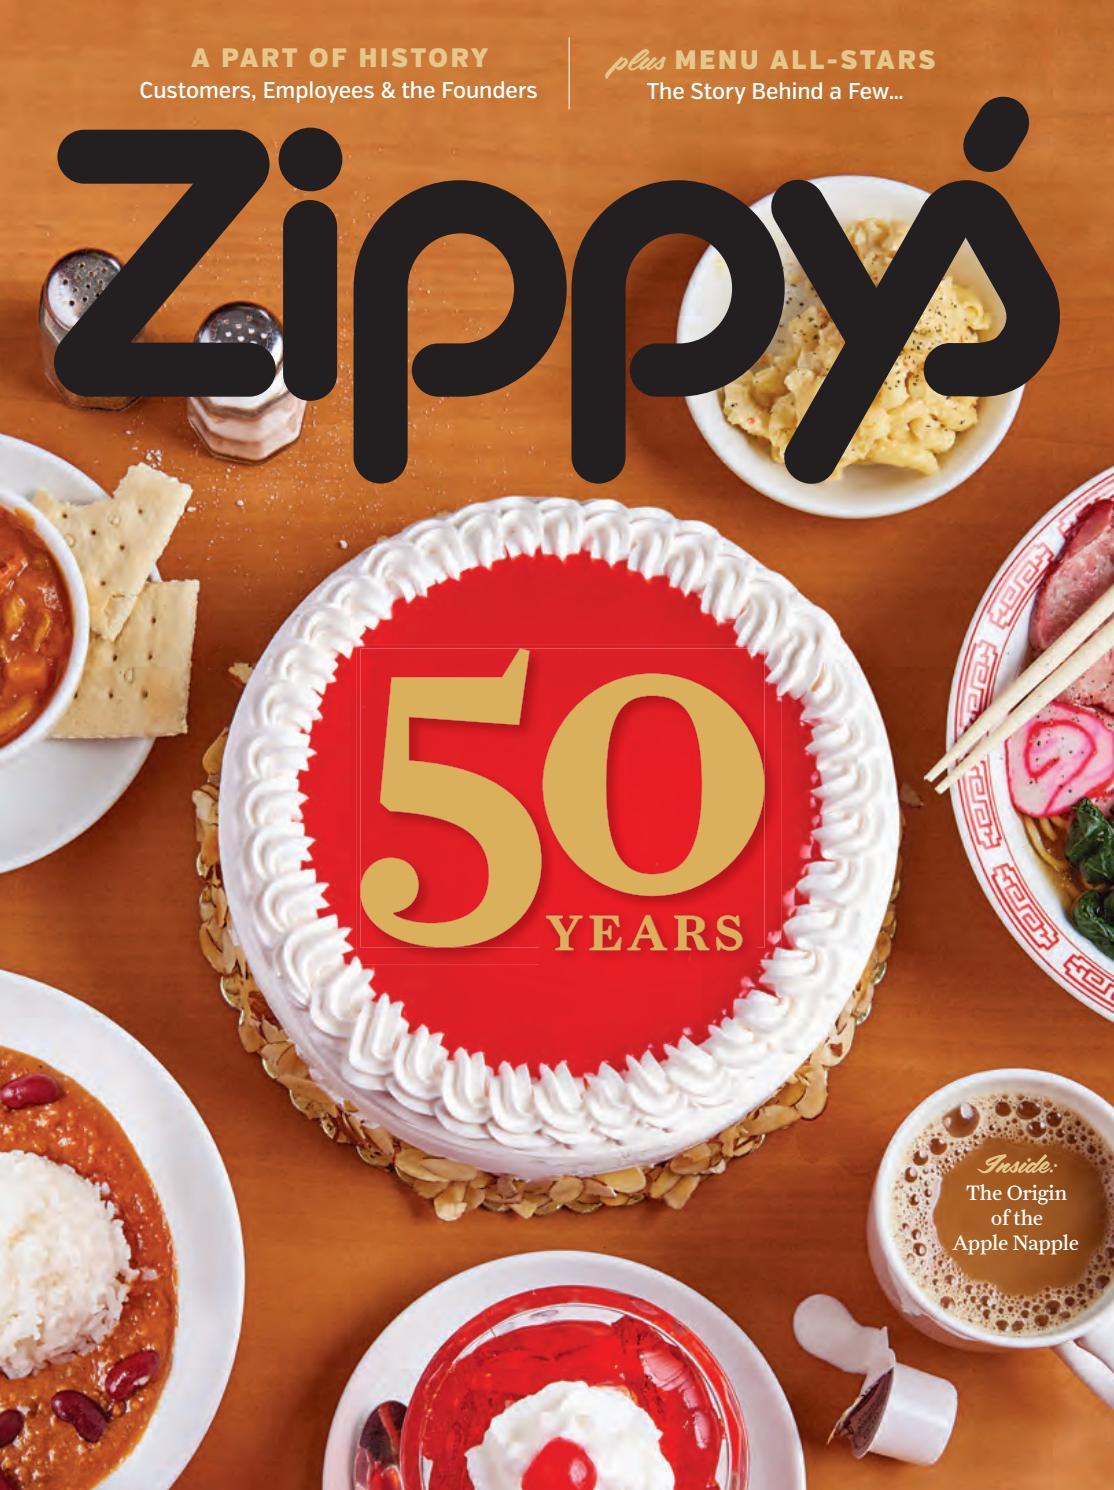 Zippys 50th Anniversary By John Rosales Issuu